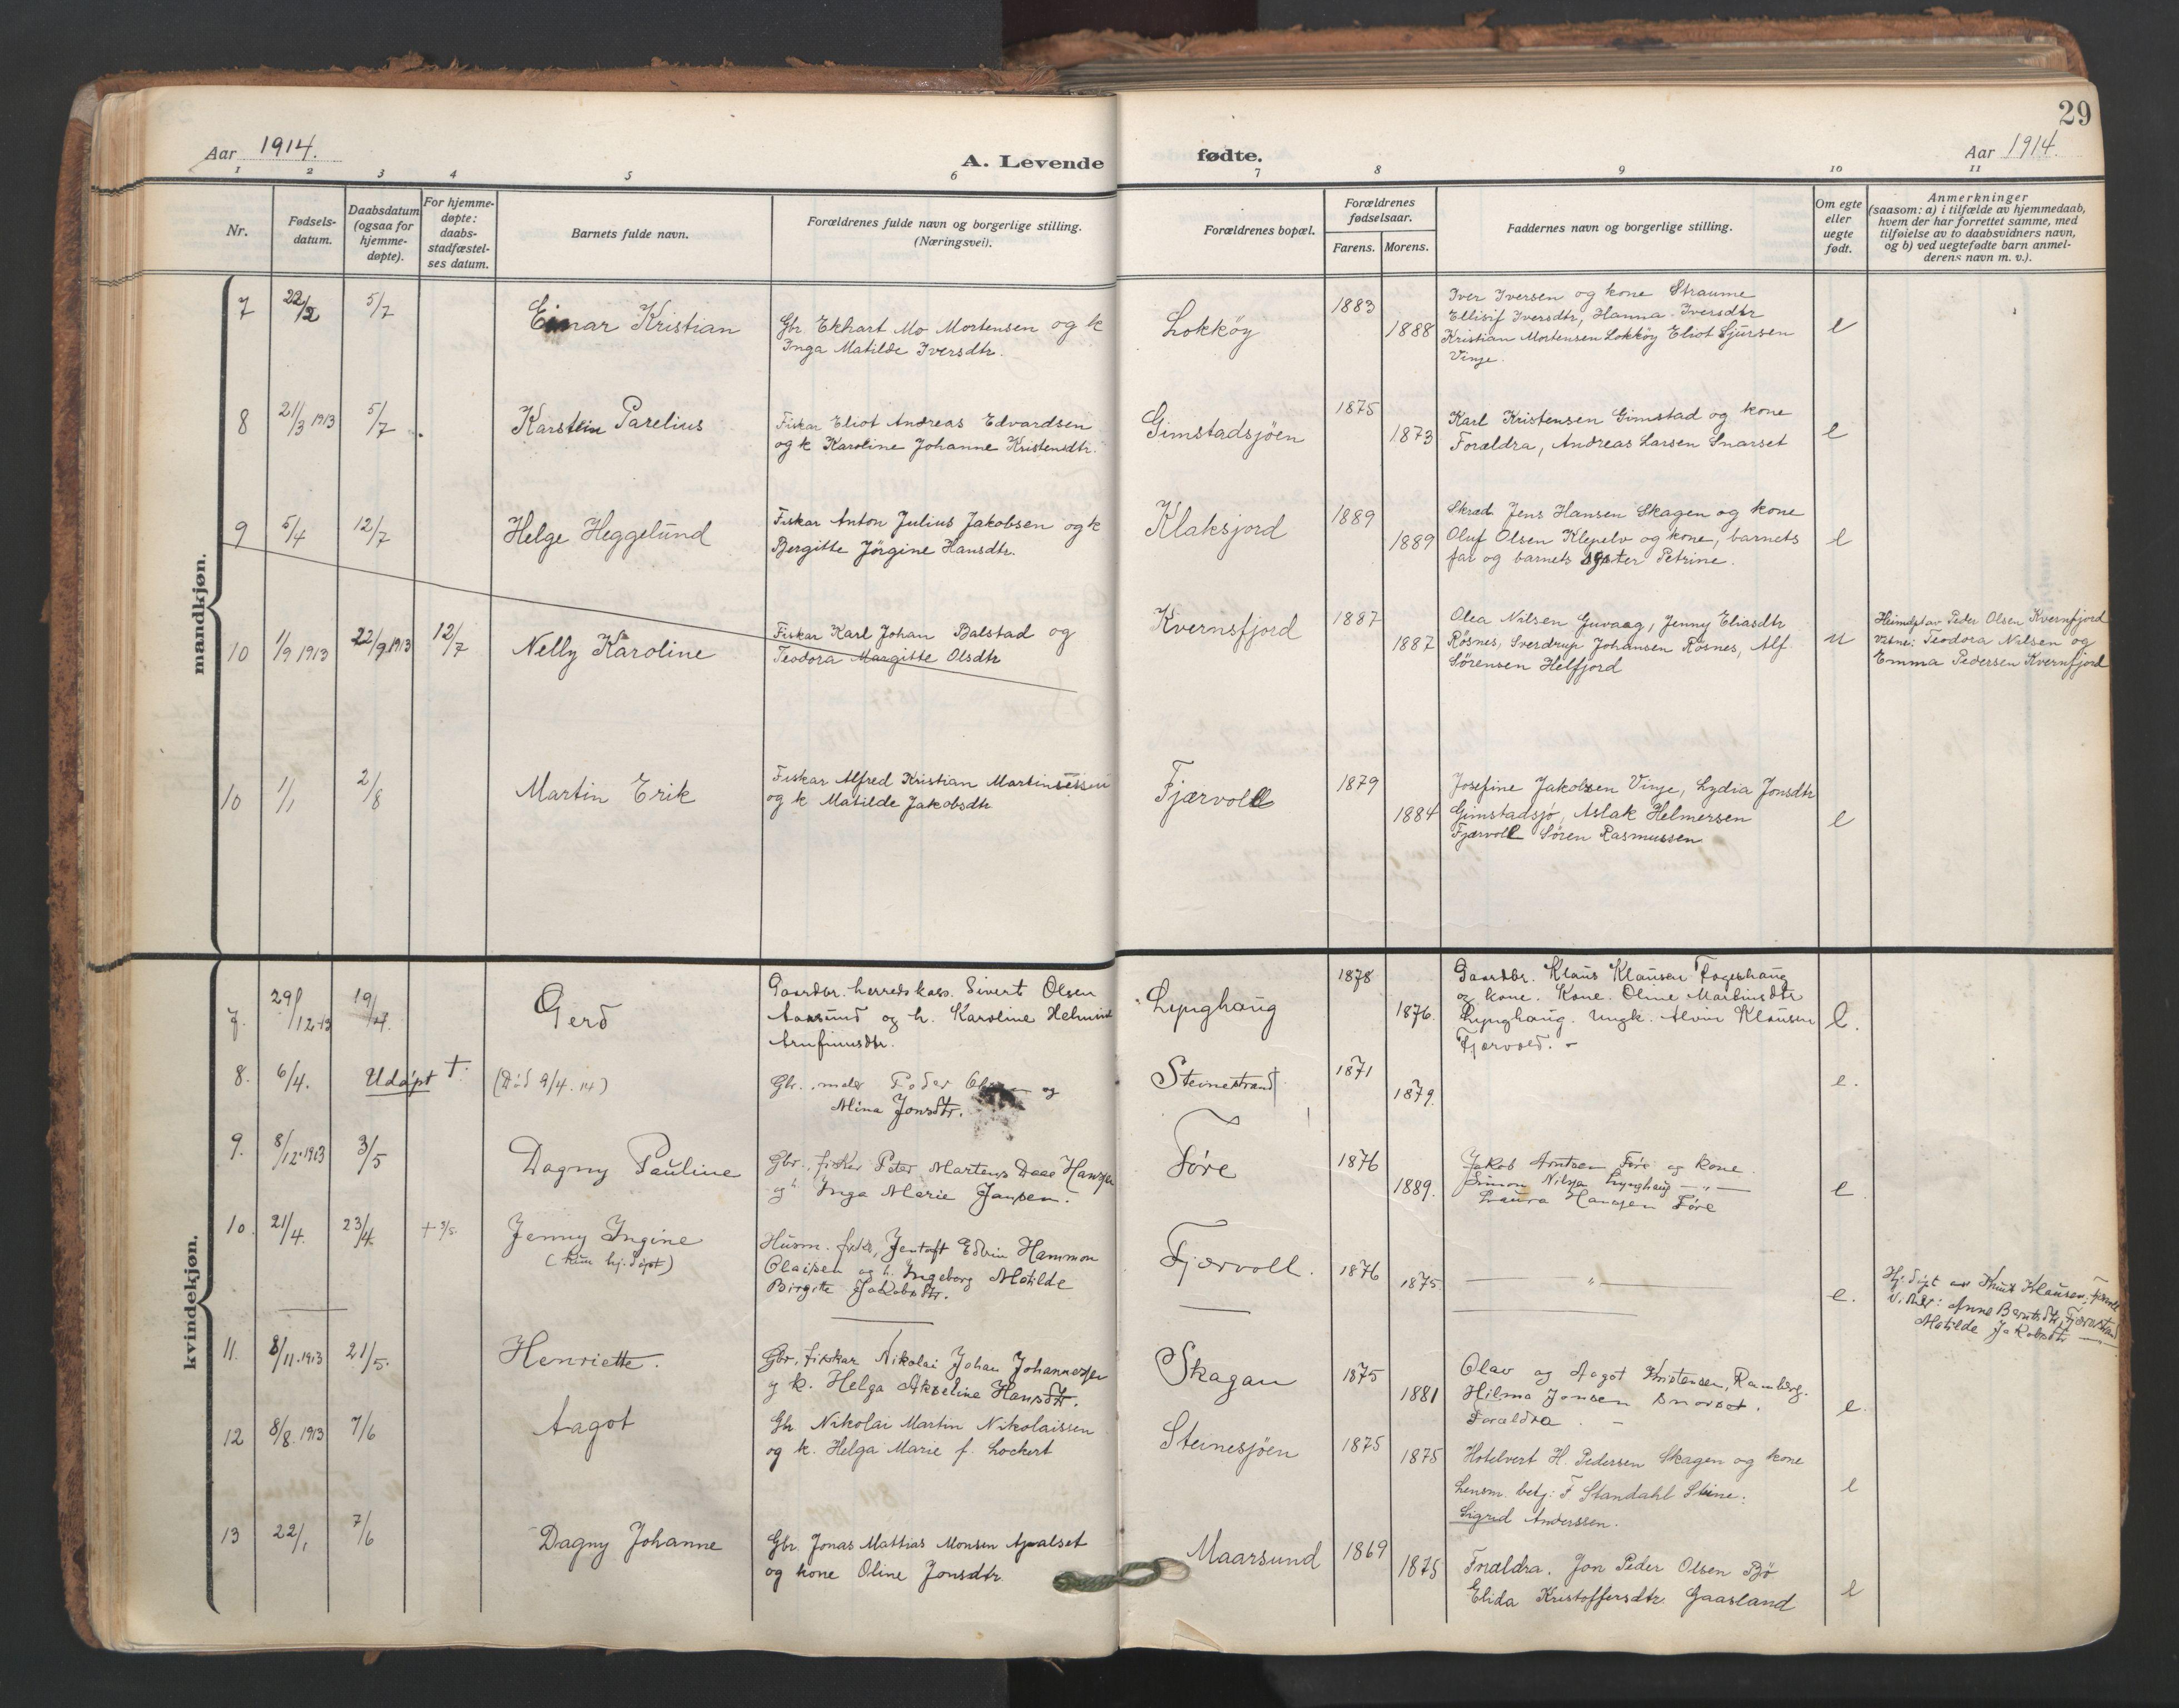 SAT, Ministerialprotokoller, klokkerbøker og fødselsregistre - Nordland, 891/L1306: Ministerialbok nr. 891A11, 1911-1927, s. 29